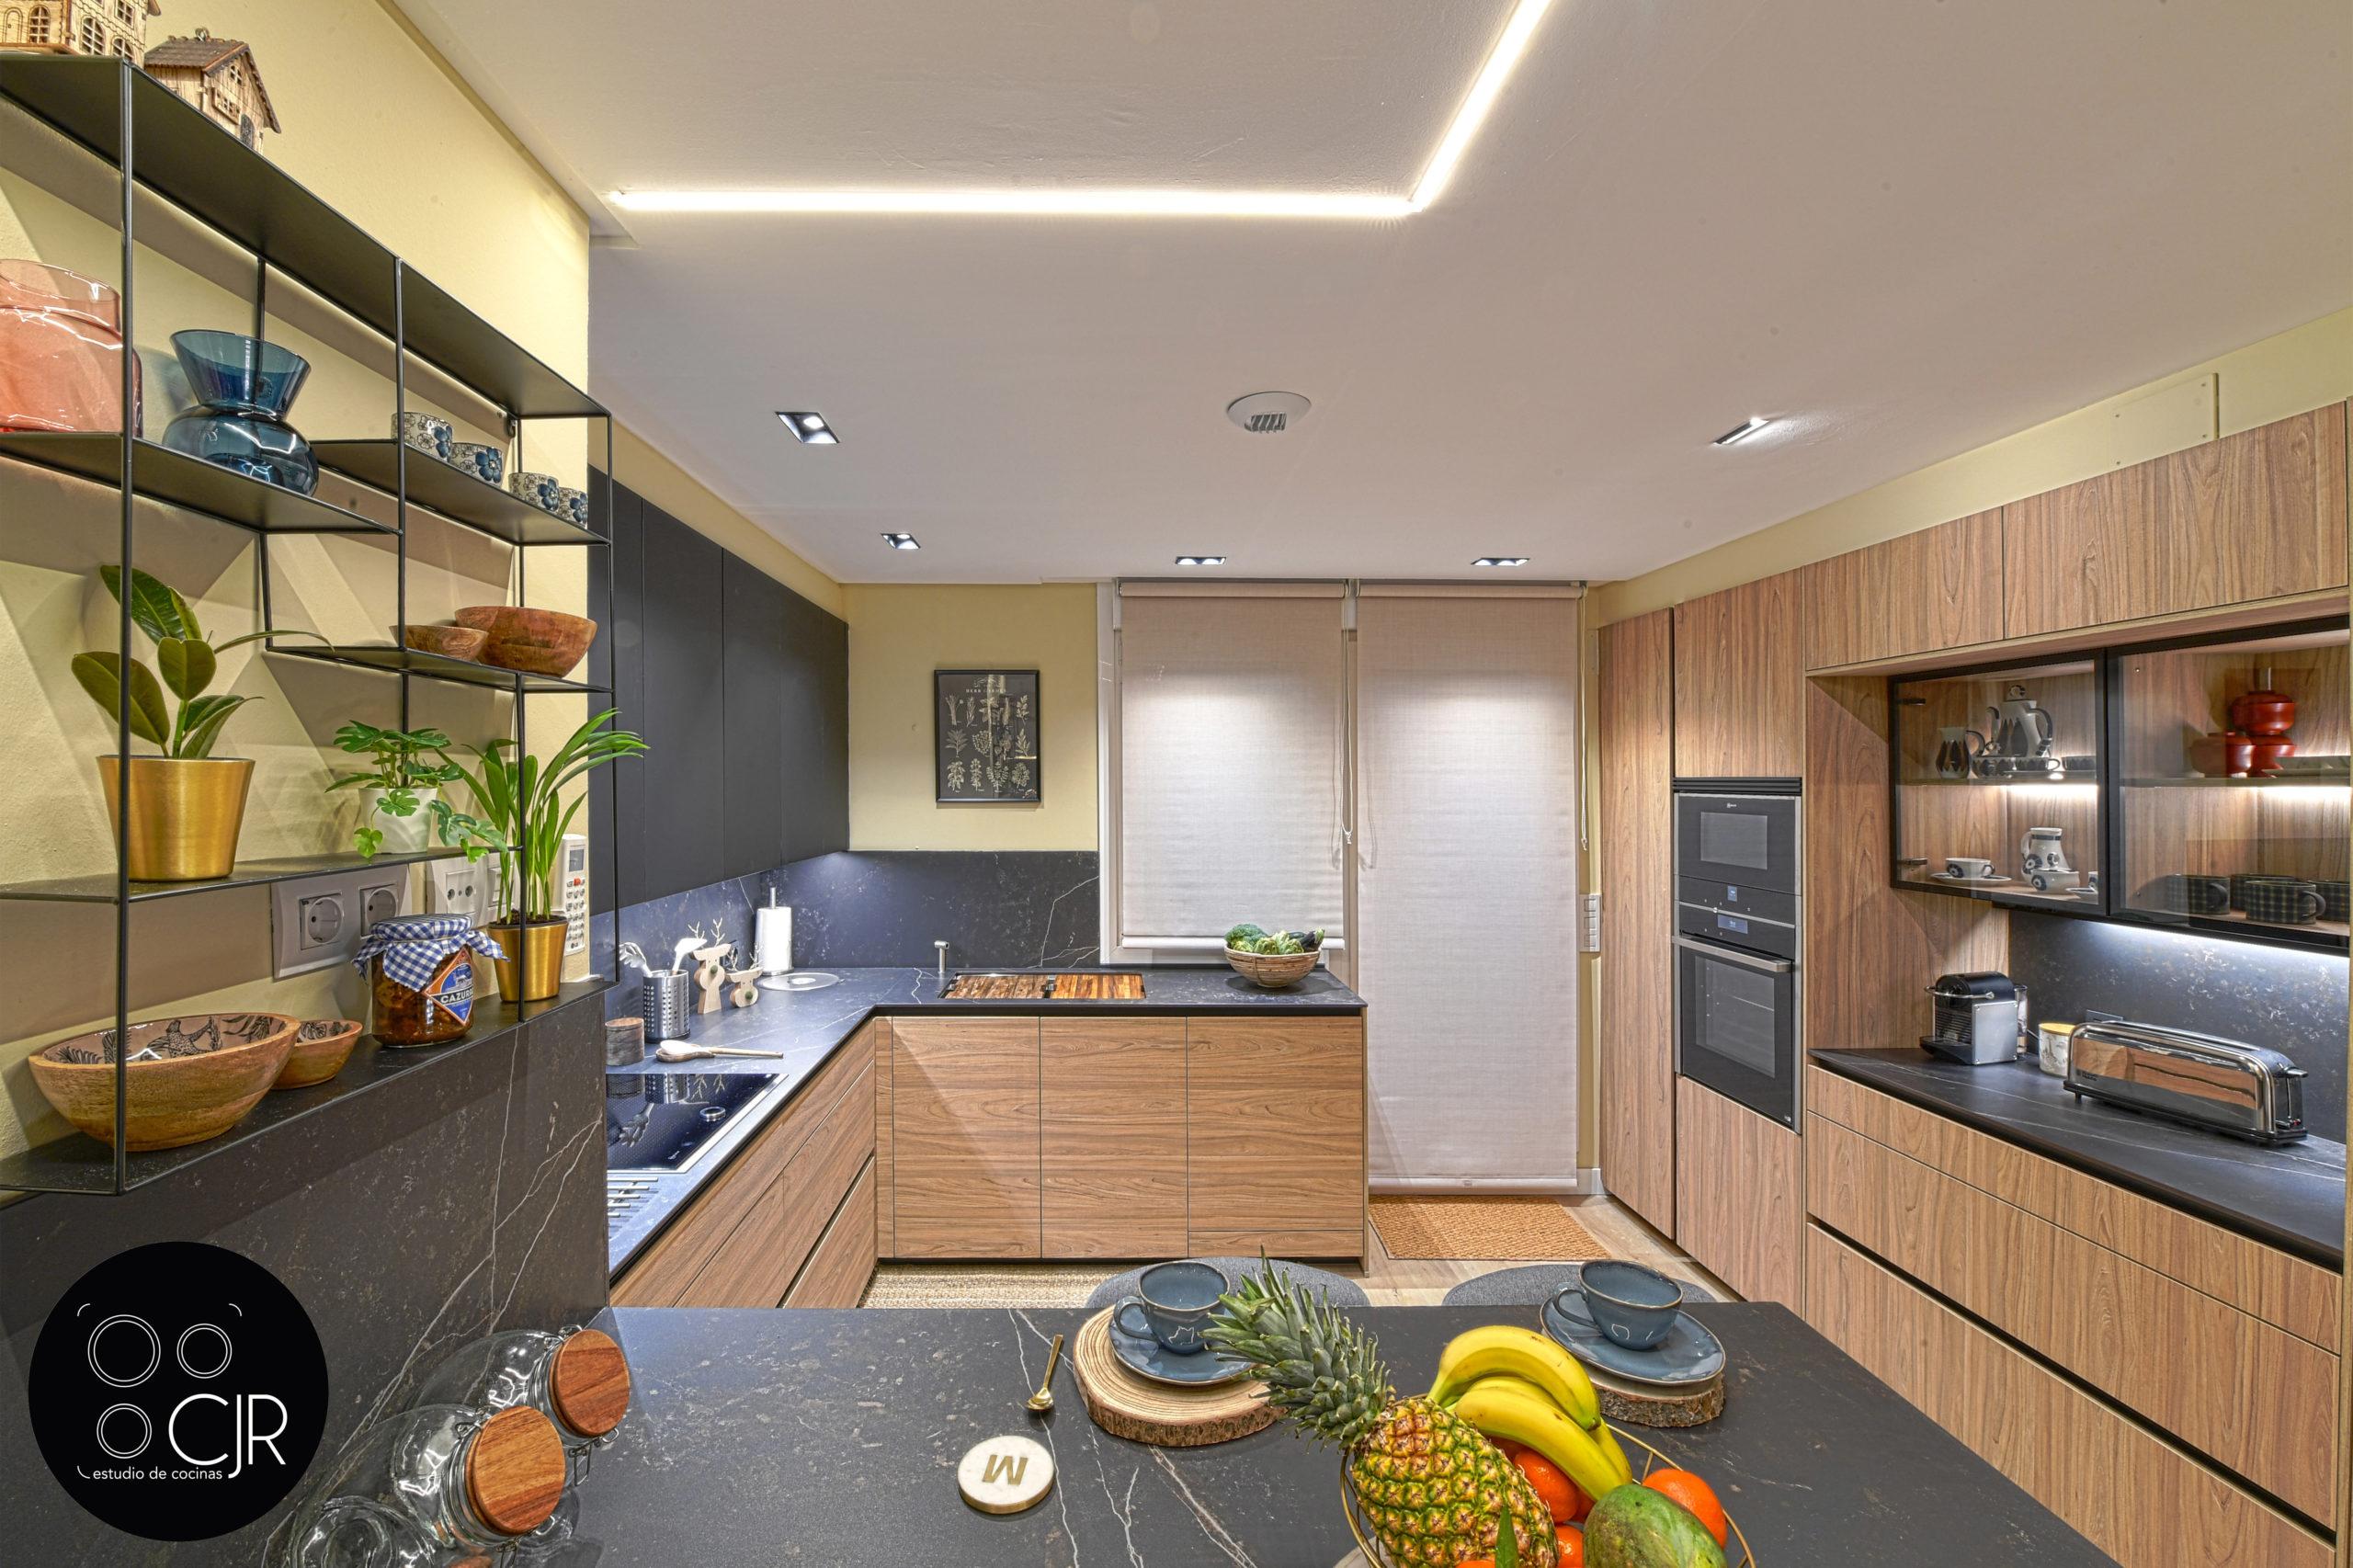 Vista frontal cercana de cocina moderna negra y madera